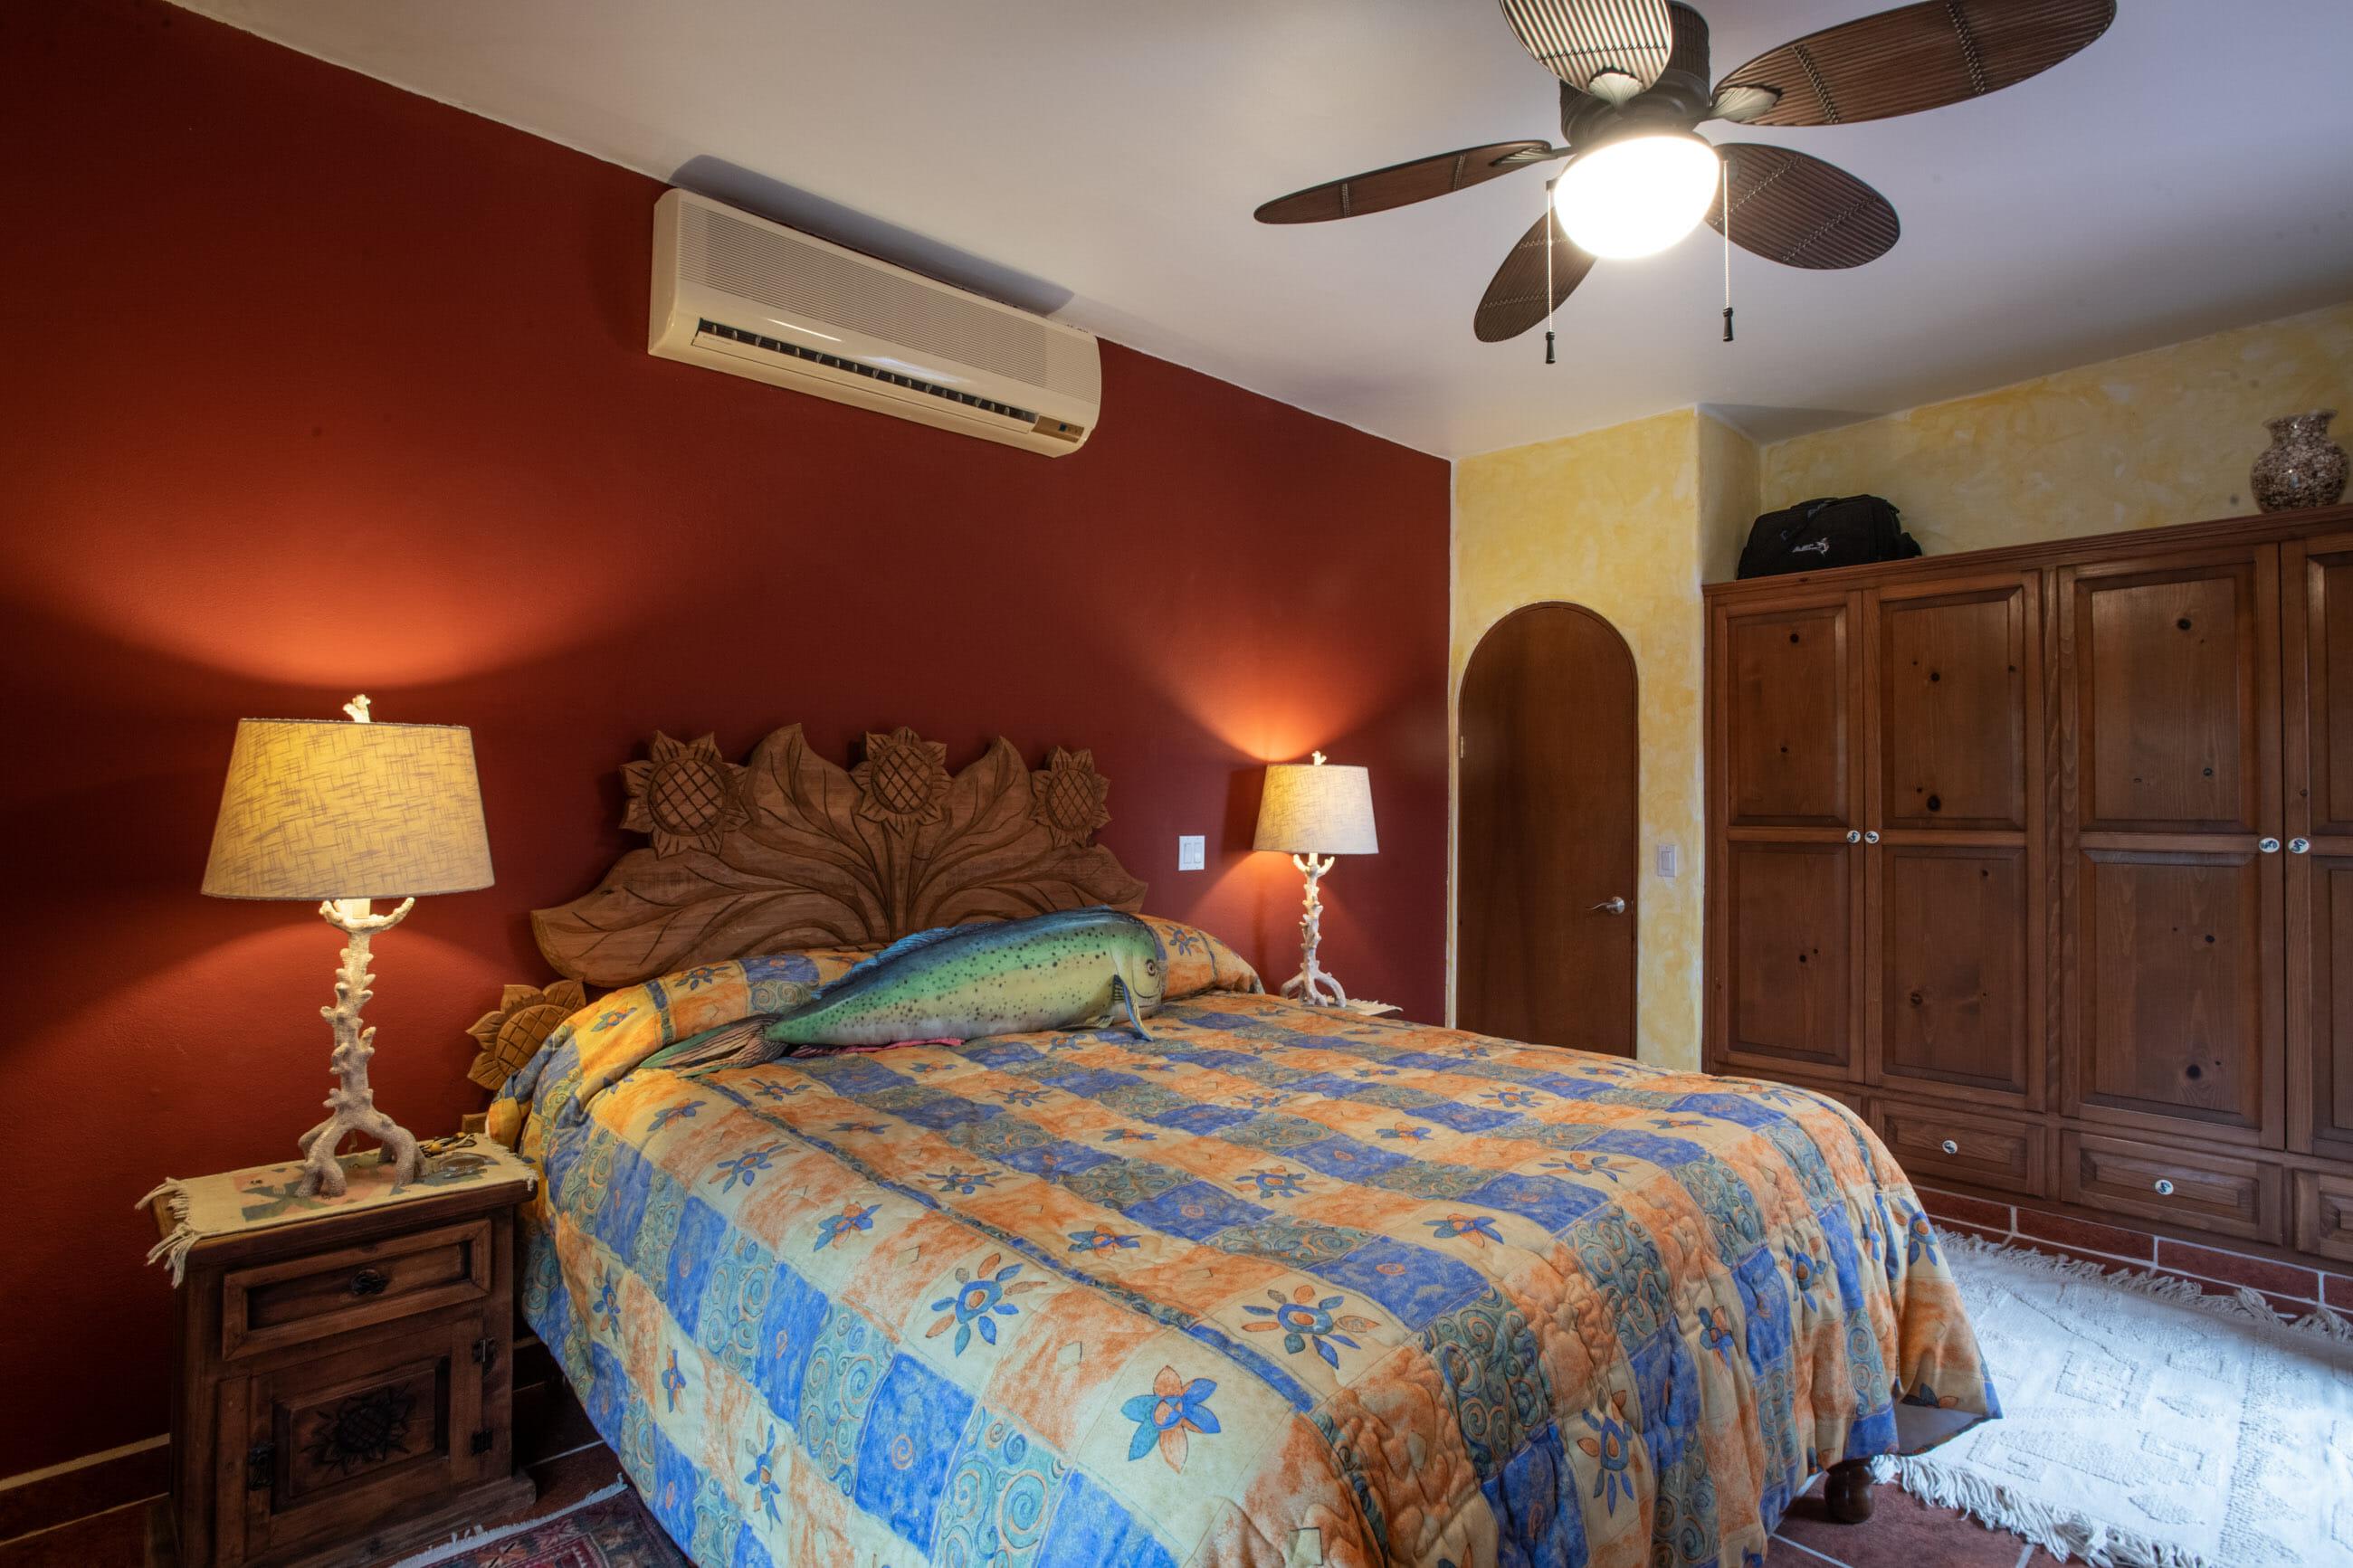 288 Davis St Loreto, Baja California Sur Mexico: Second guest bedroom